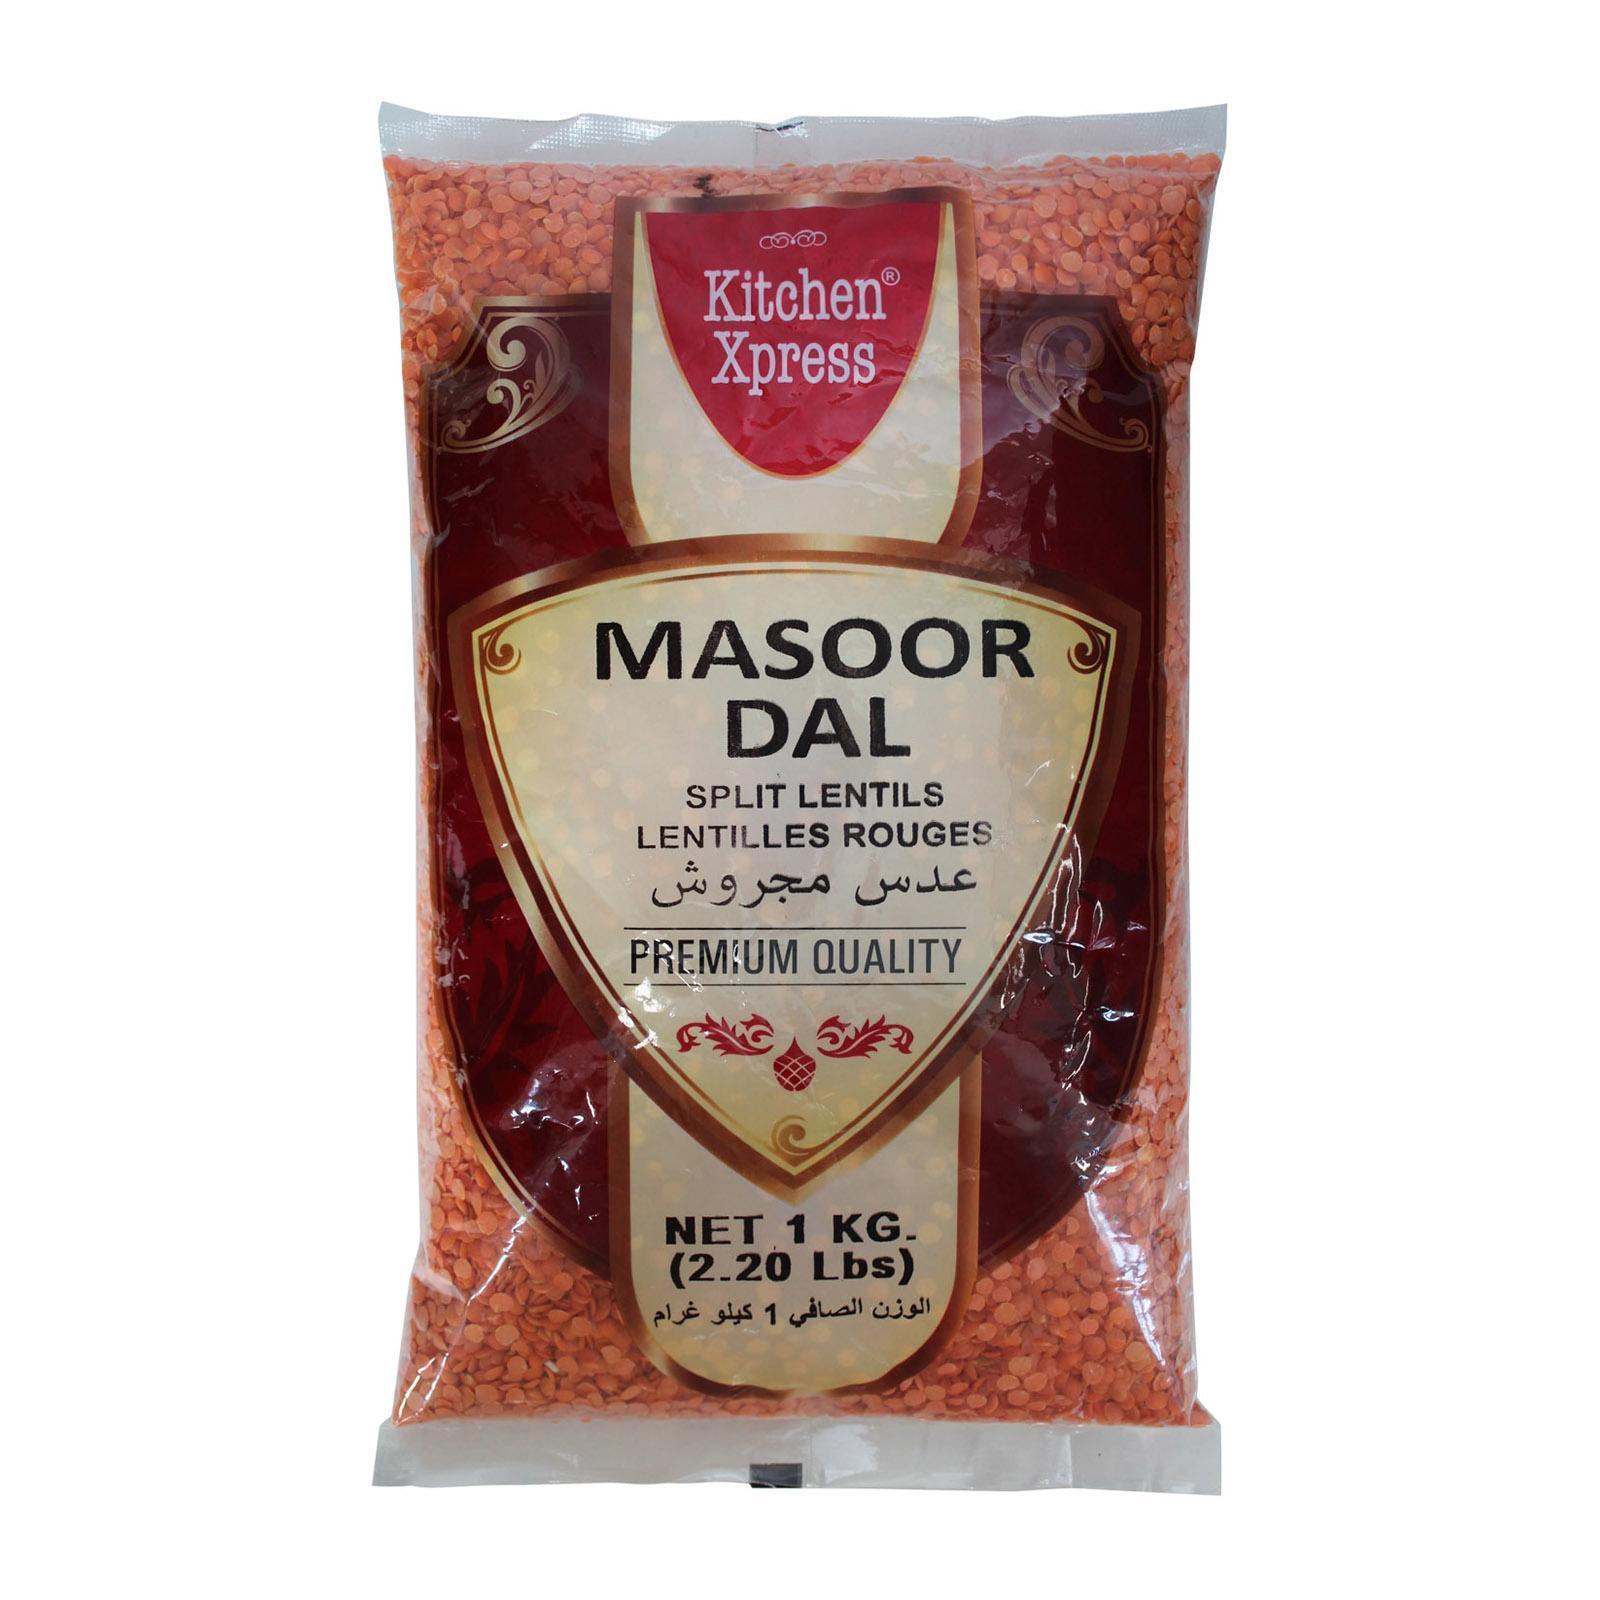 Kitchen Xpress Masoor Dal - By Dashmesh